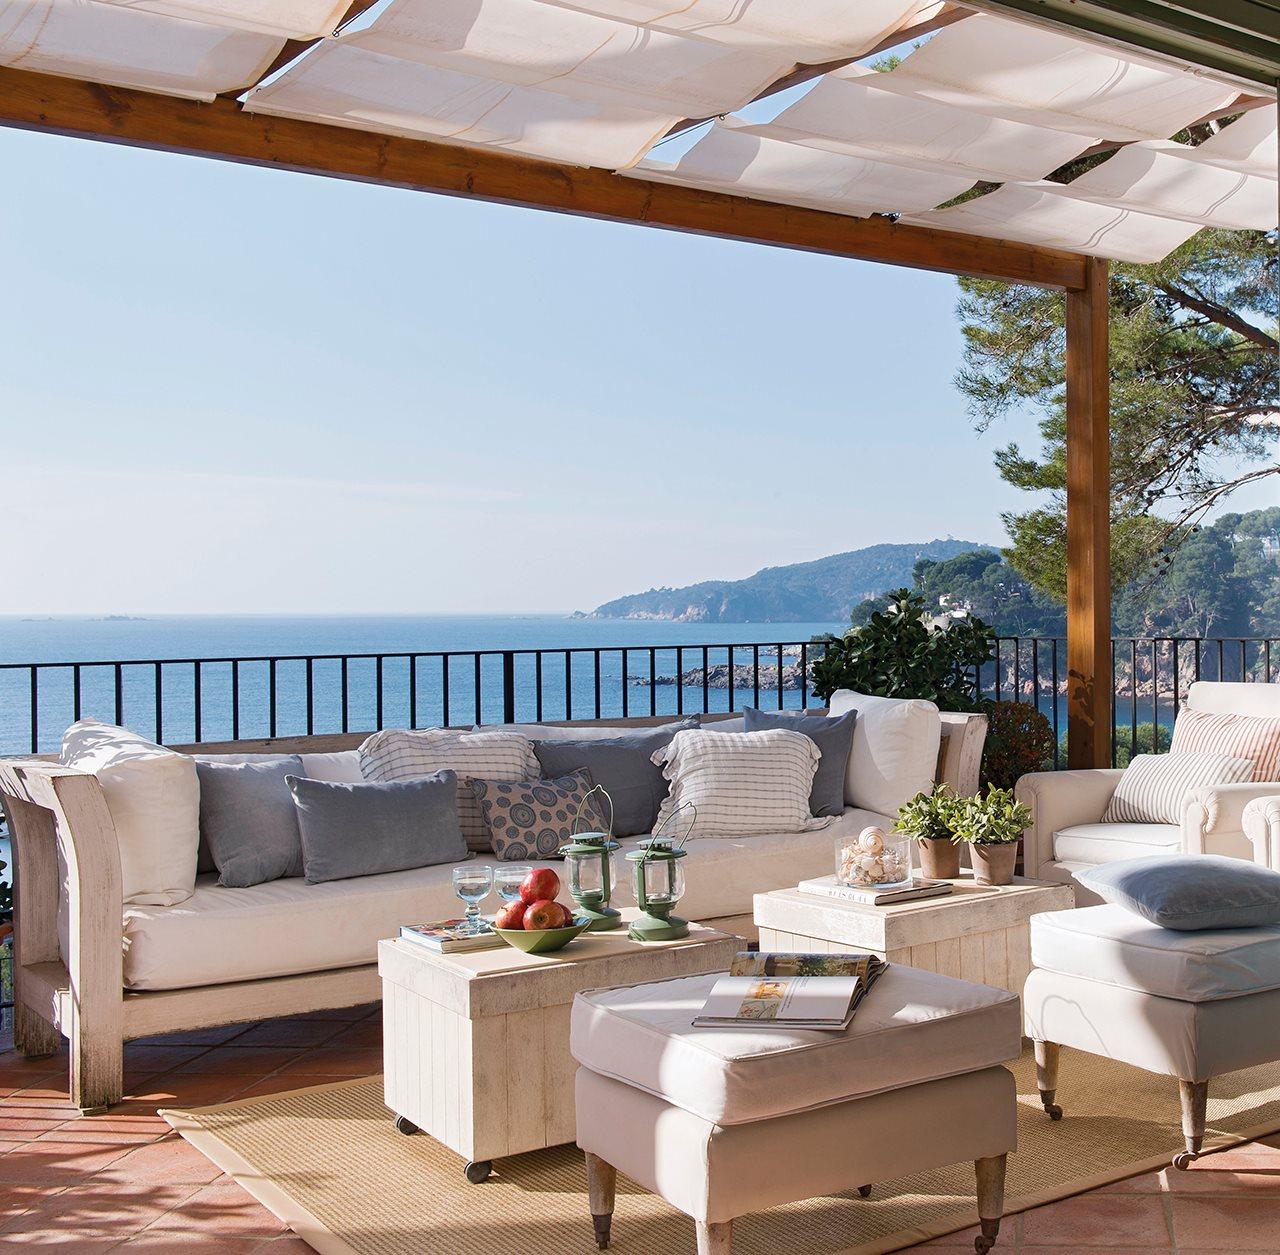 Como cubrir una terraza fabulous despus cubrir terraza for Terrazas 1280 a